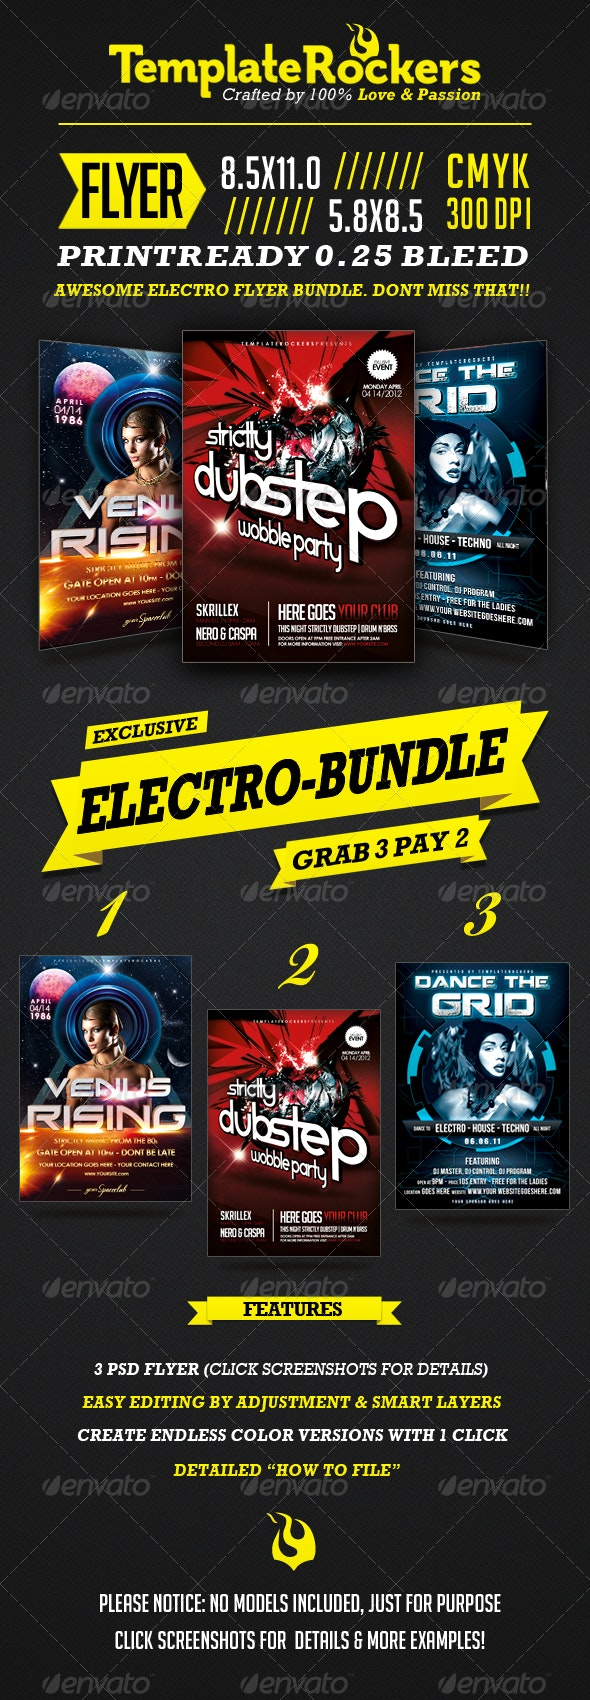 Electro Bundle   3 Party Flyer - Flyers Print Templates